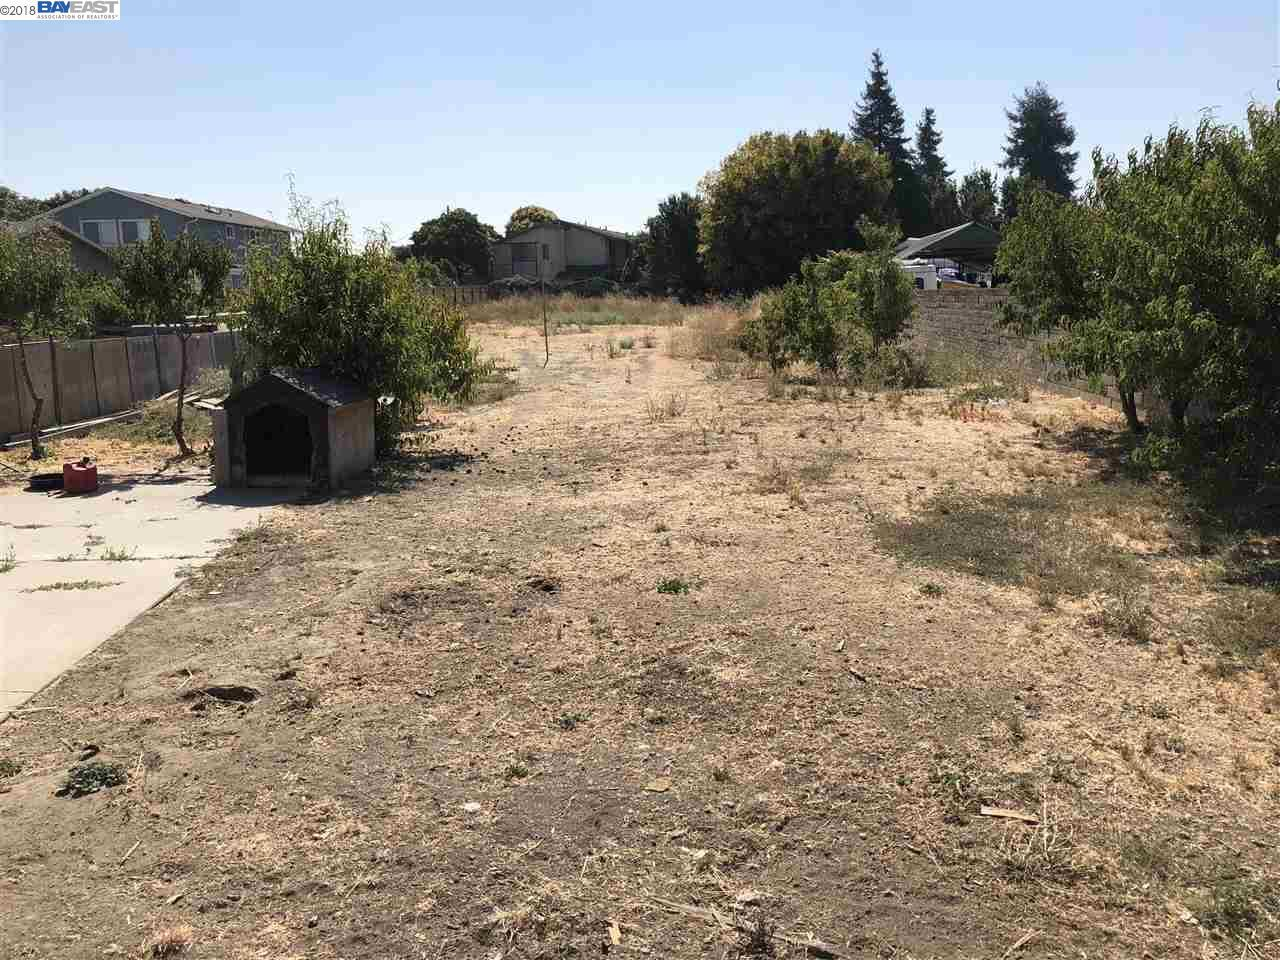 Hayward Real Estate   Find Land for Sale in Hayward, CA   Century 21